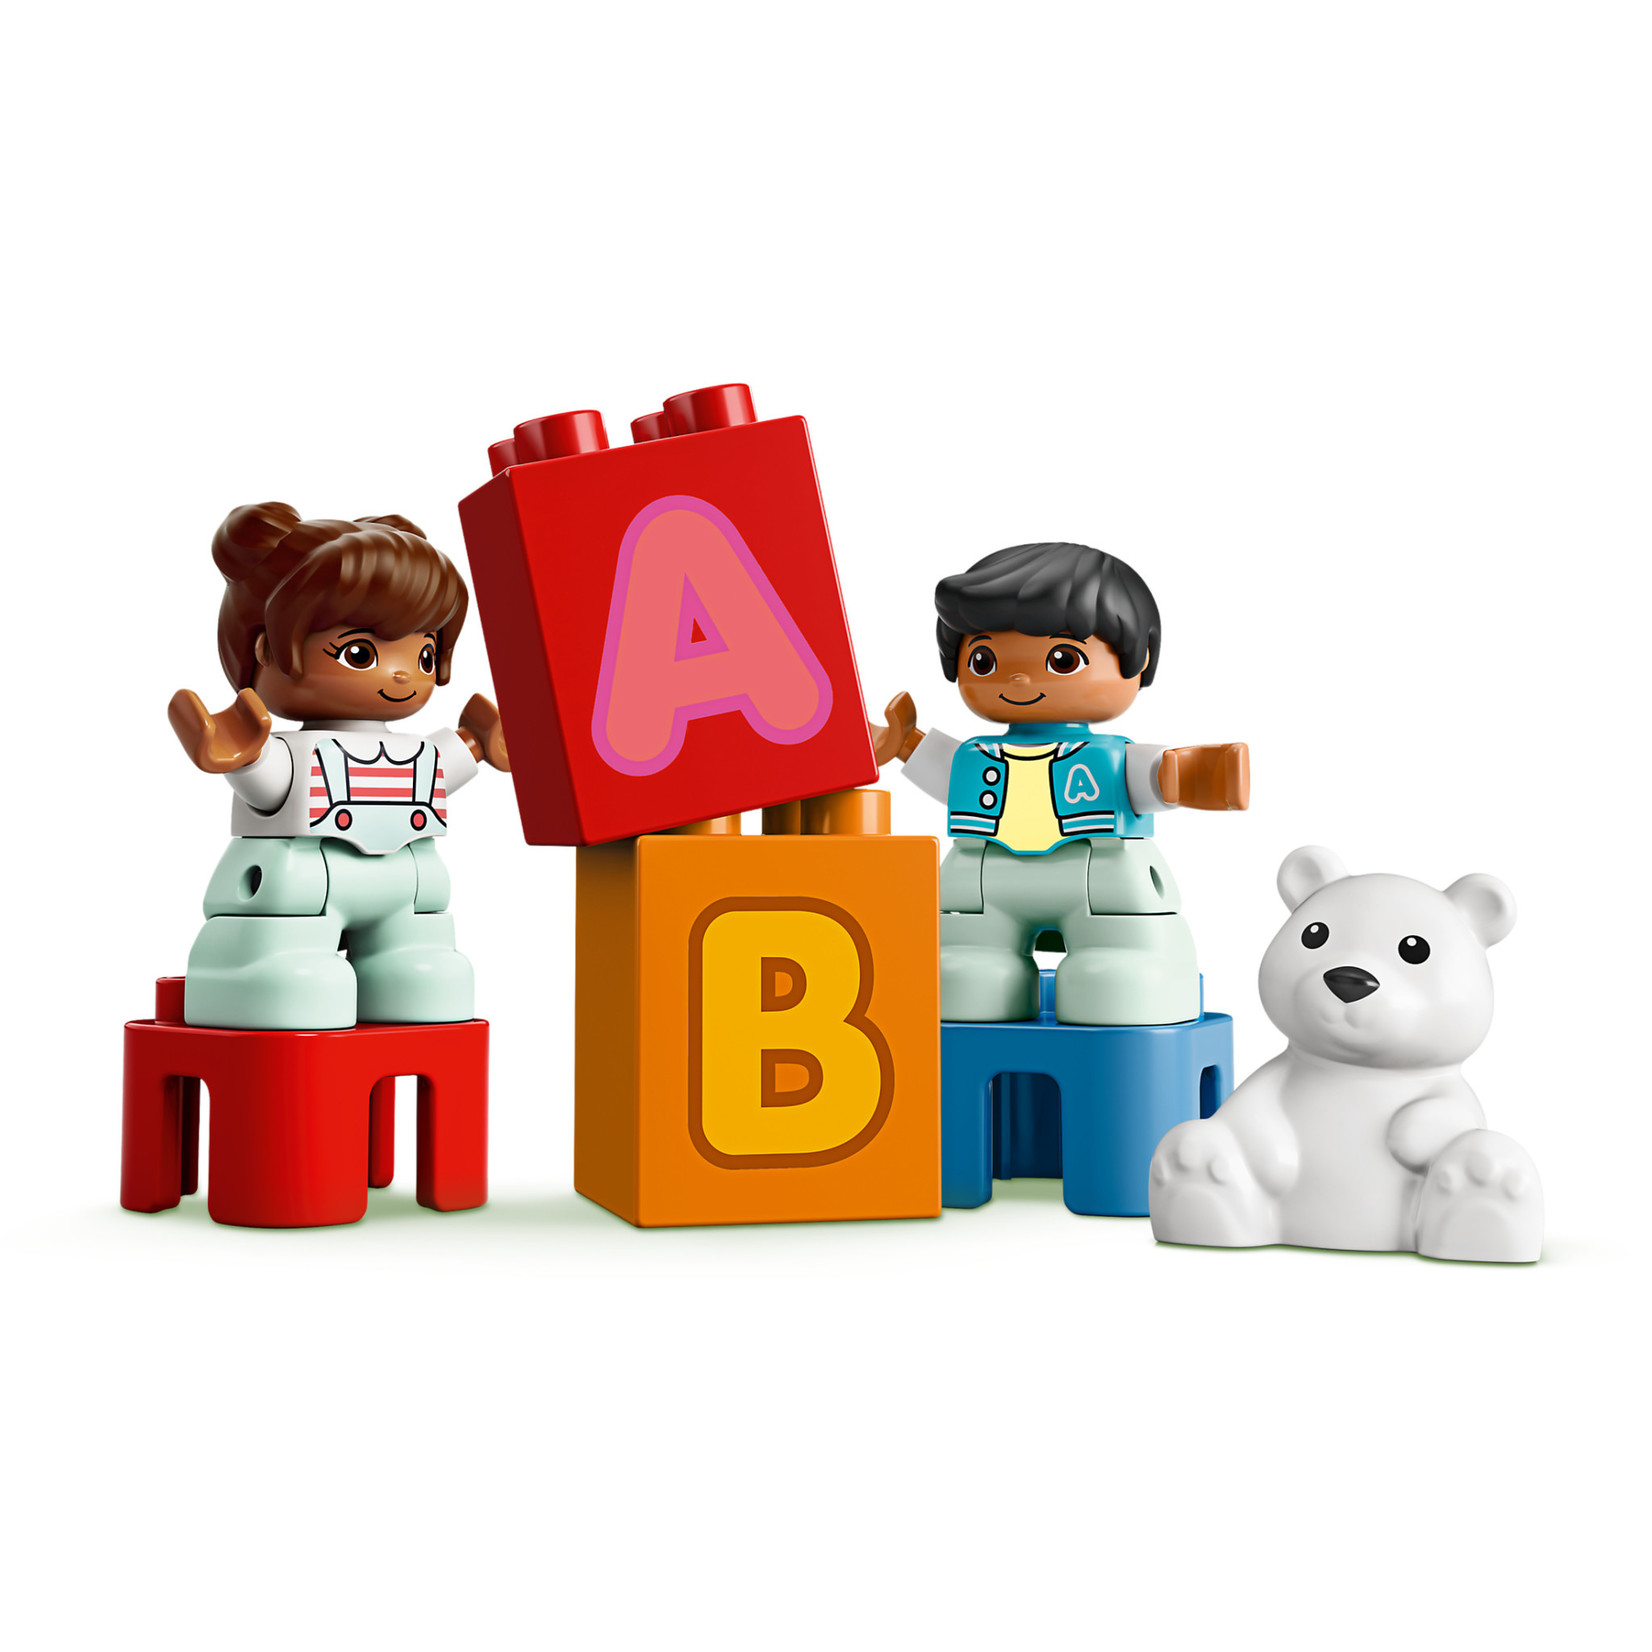 LEGO LEGO Duplo Alphabet Truck 36p (10915)